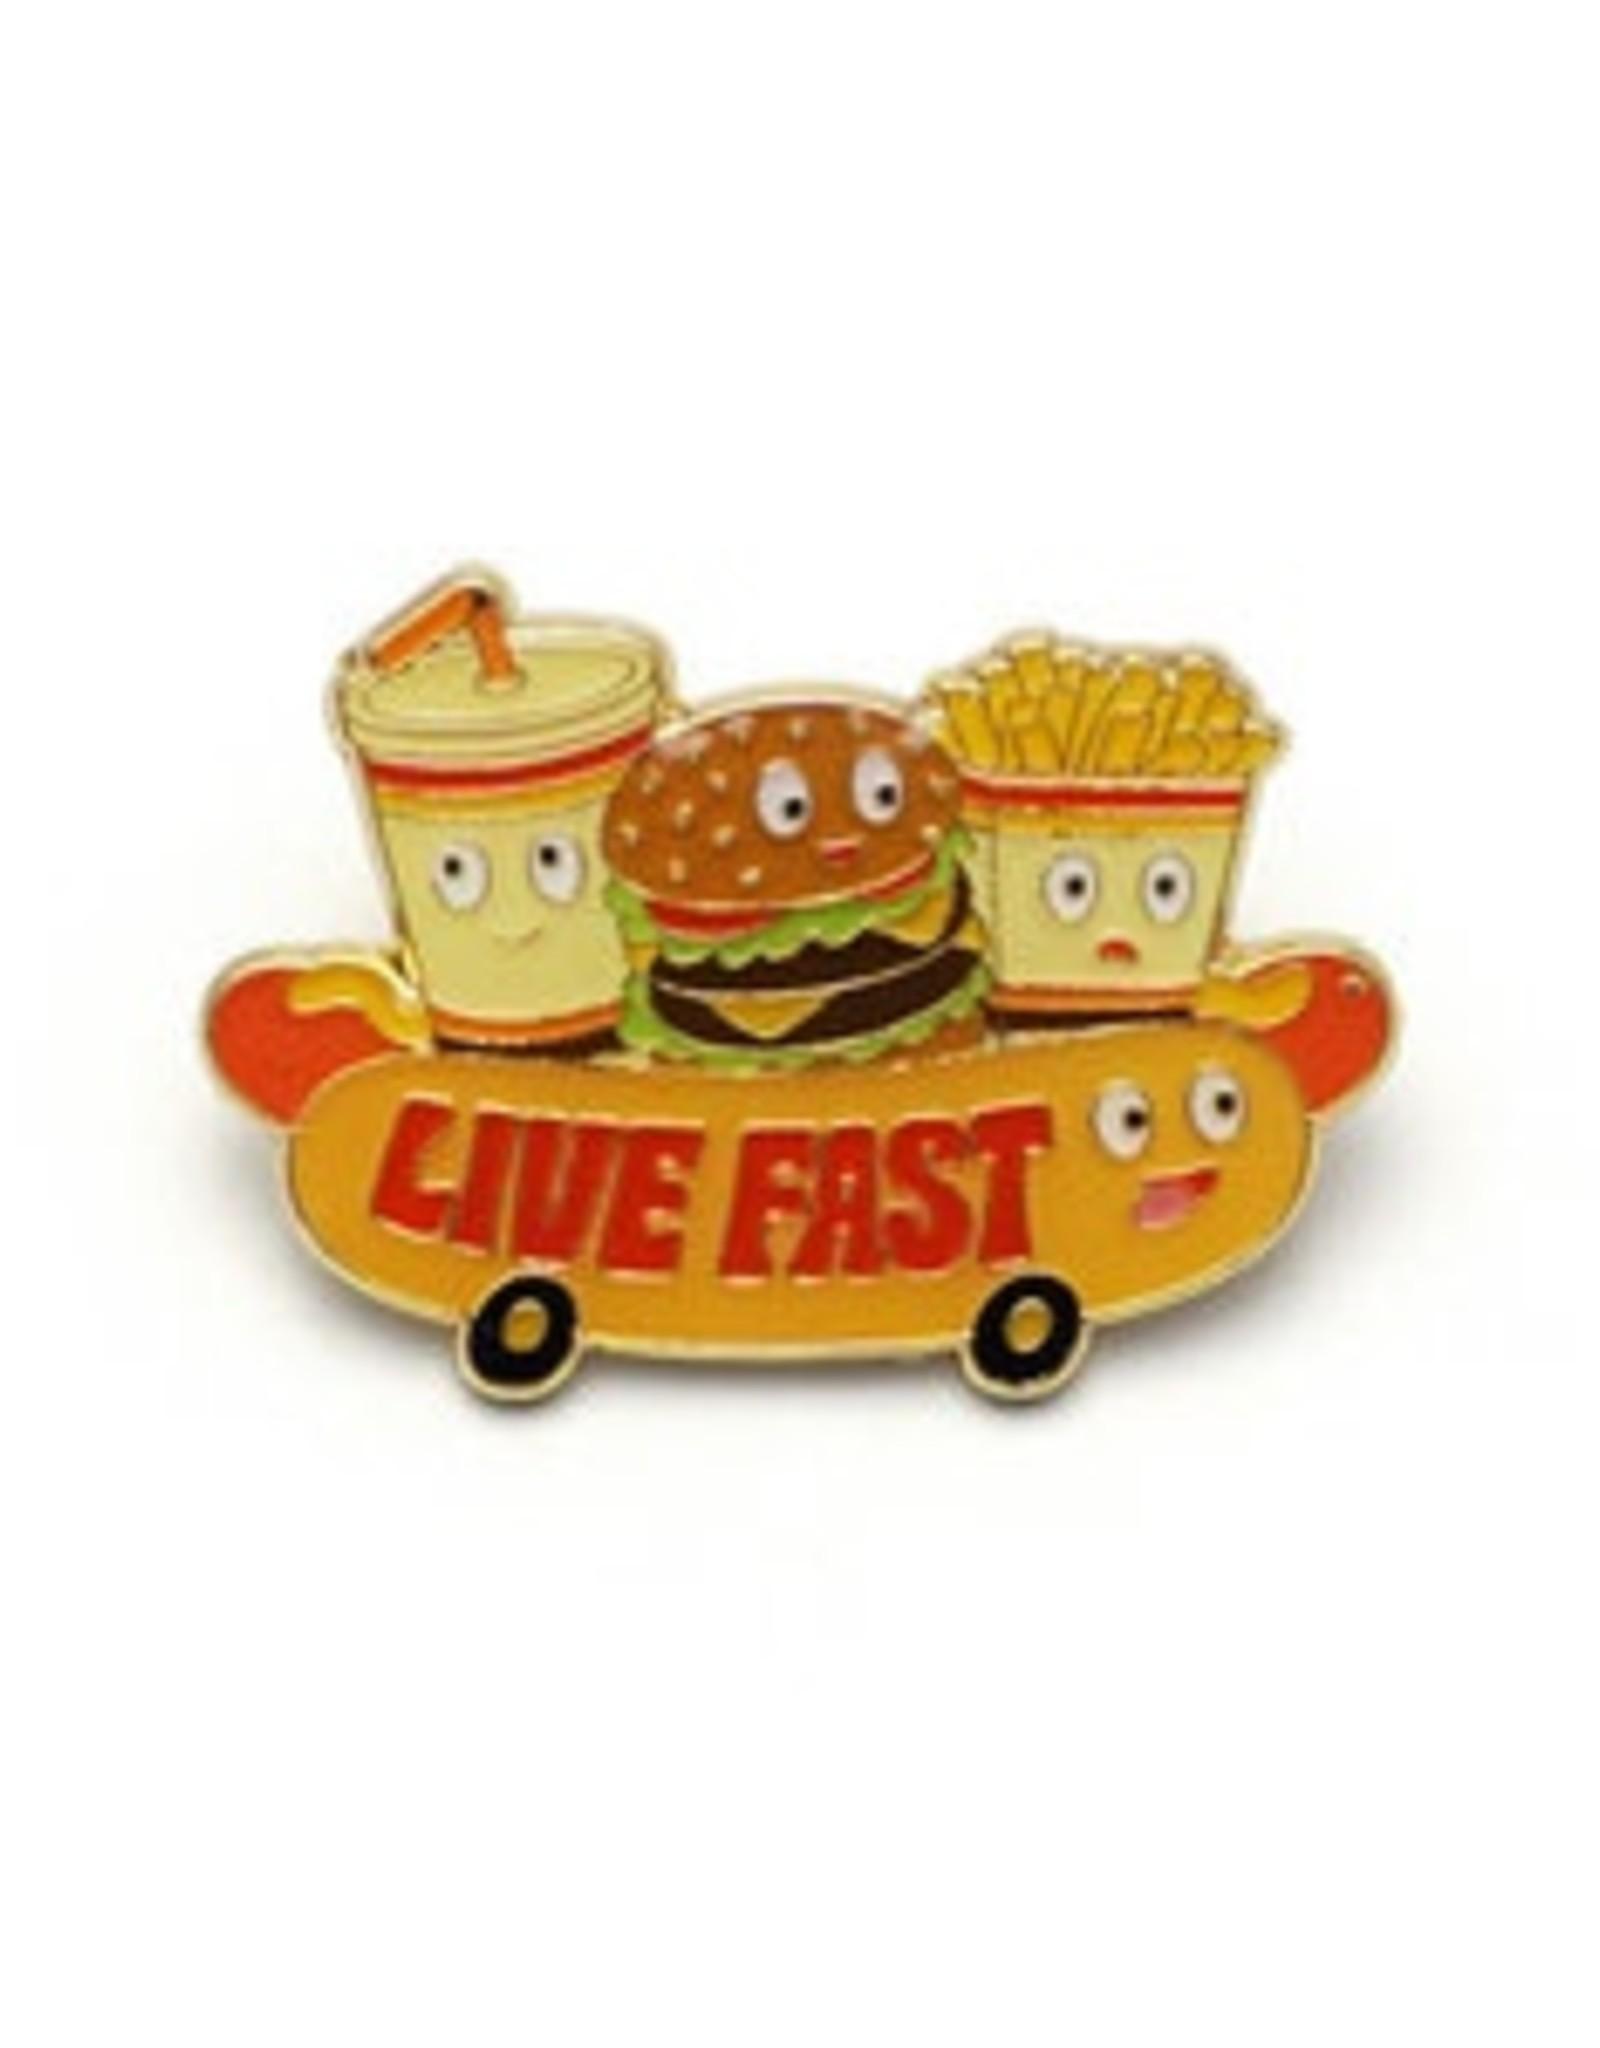 Live Fast Enamel Pin